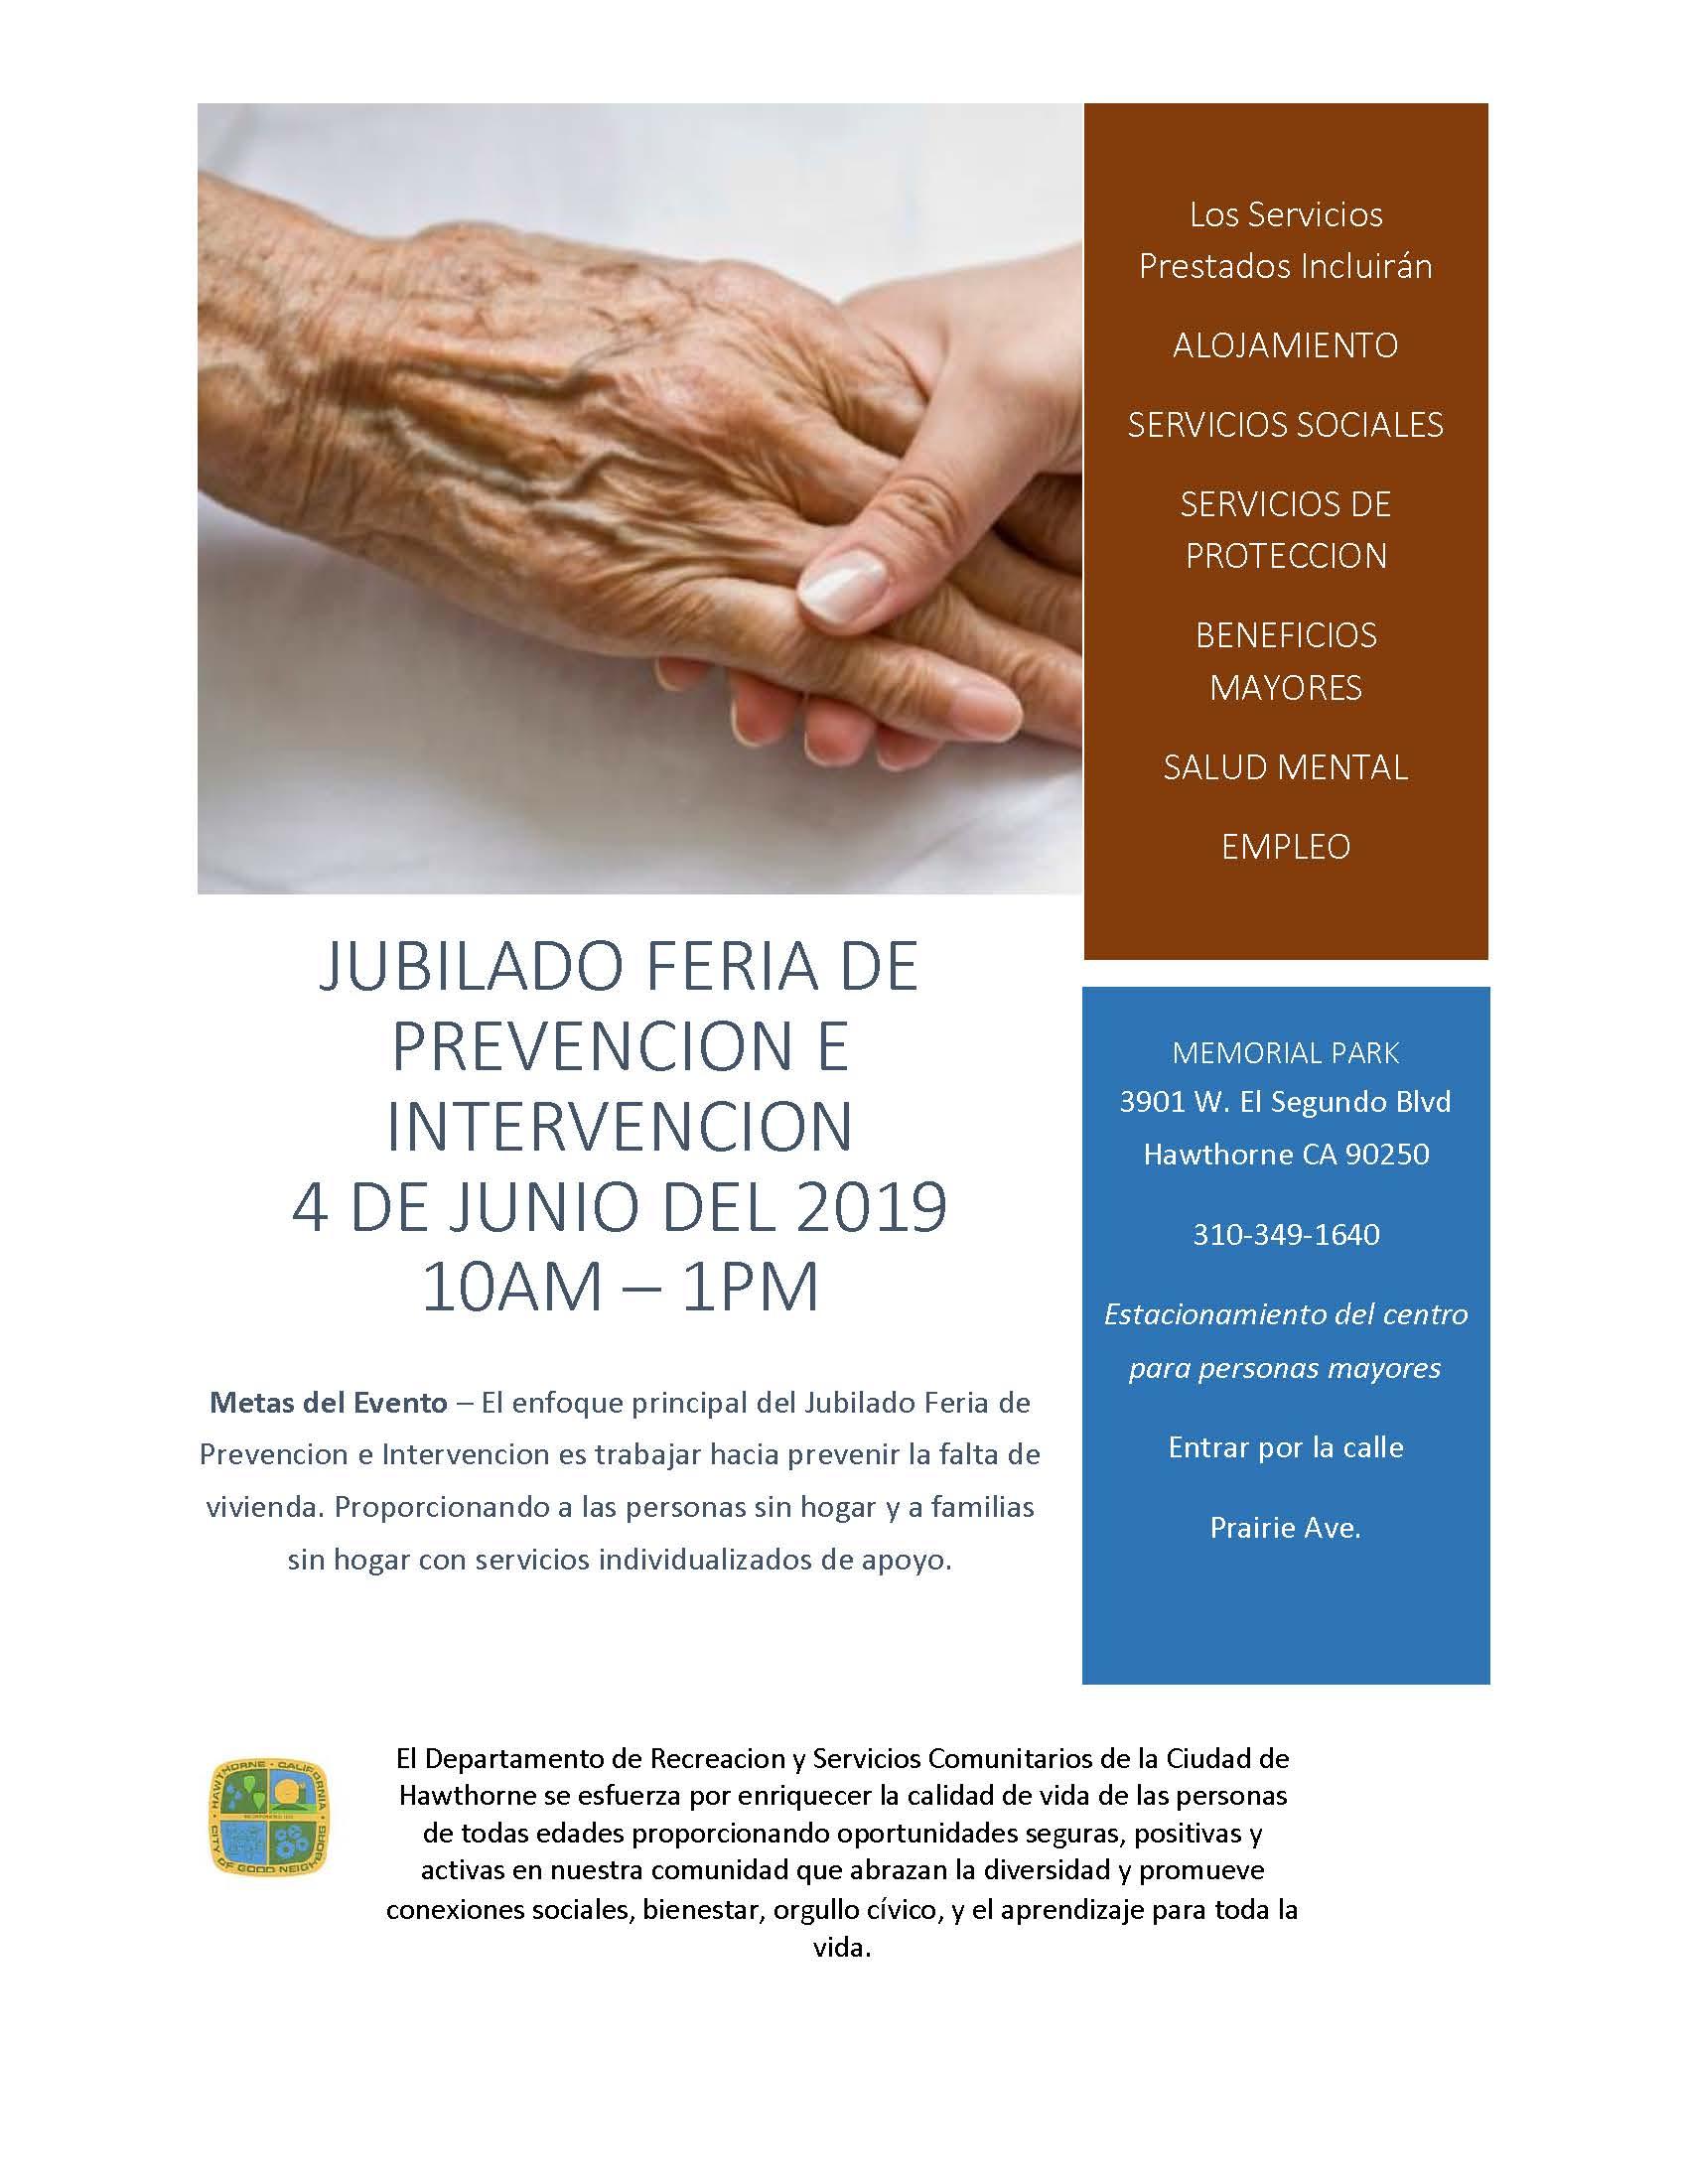 Senior Citizen Prevention and Intervention Fair - Spanish